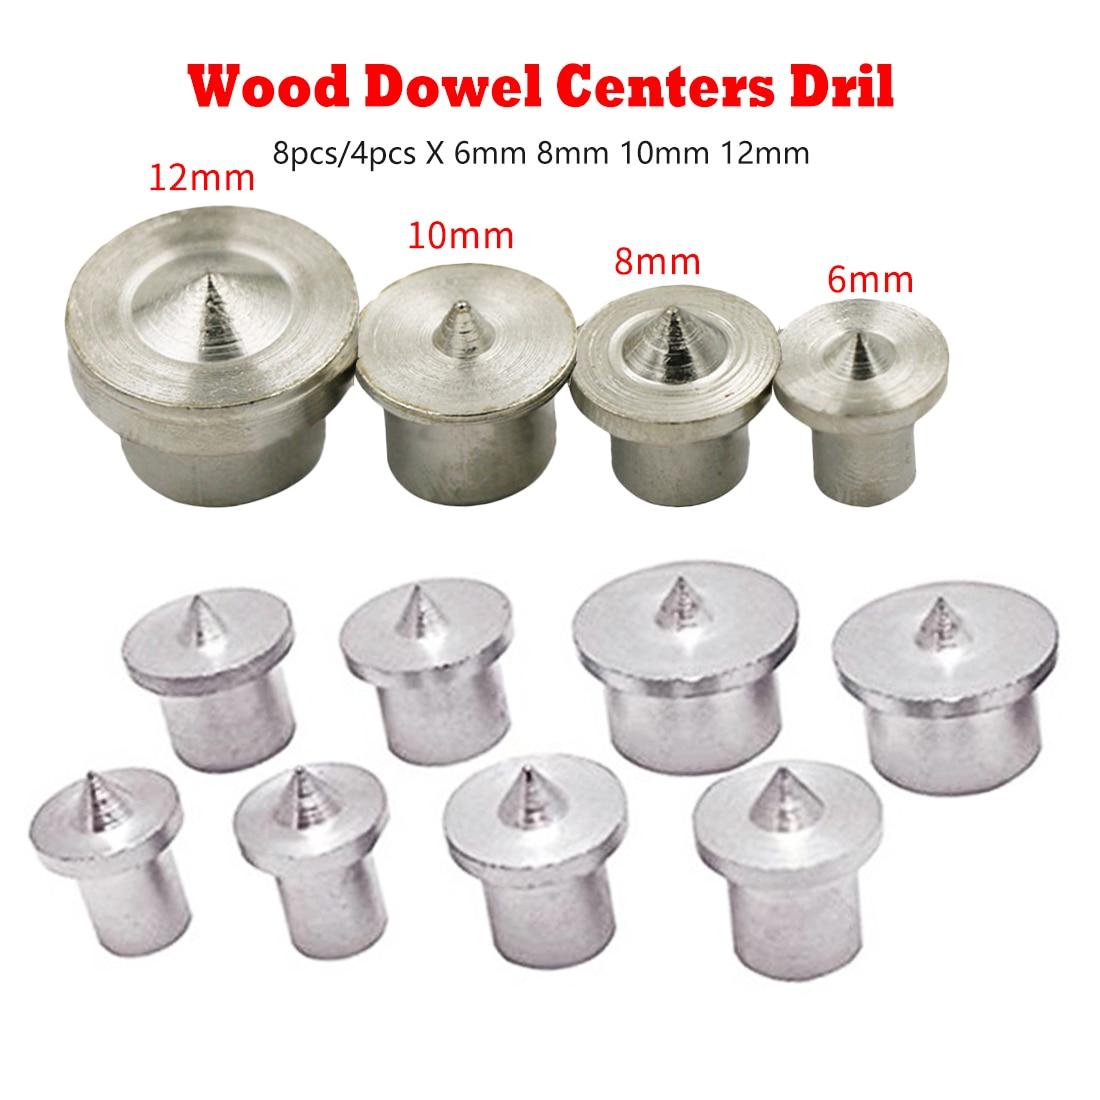 Woodworking Tools Dowel Centre Point Pin Set 8pcs/4pcs 6mm 8mm10mm 12mm Dowel Tenon Center Set Transfer Plugs Wood Drill